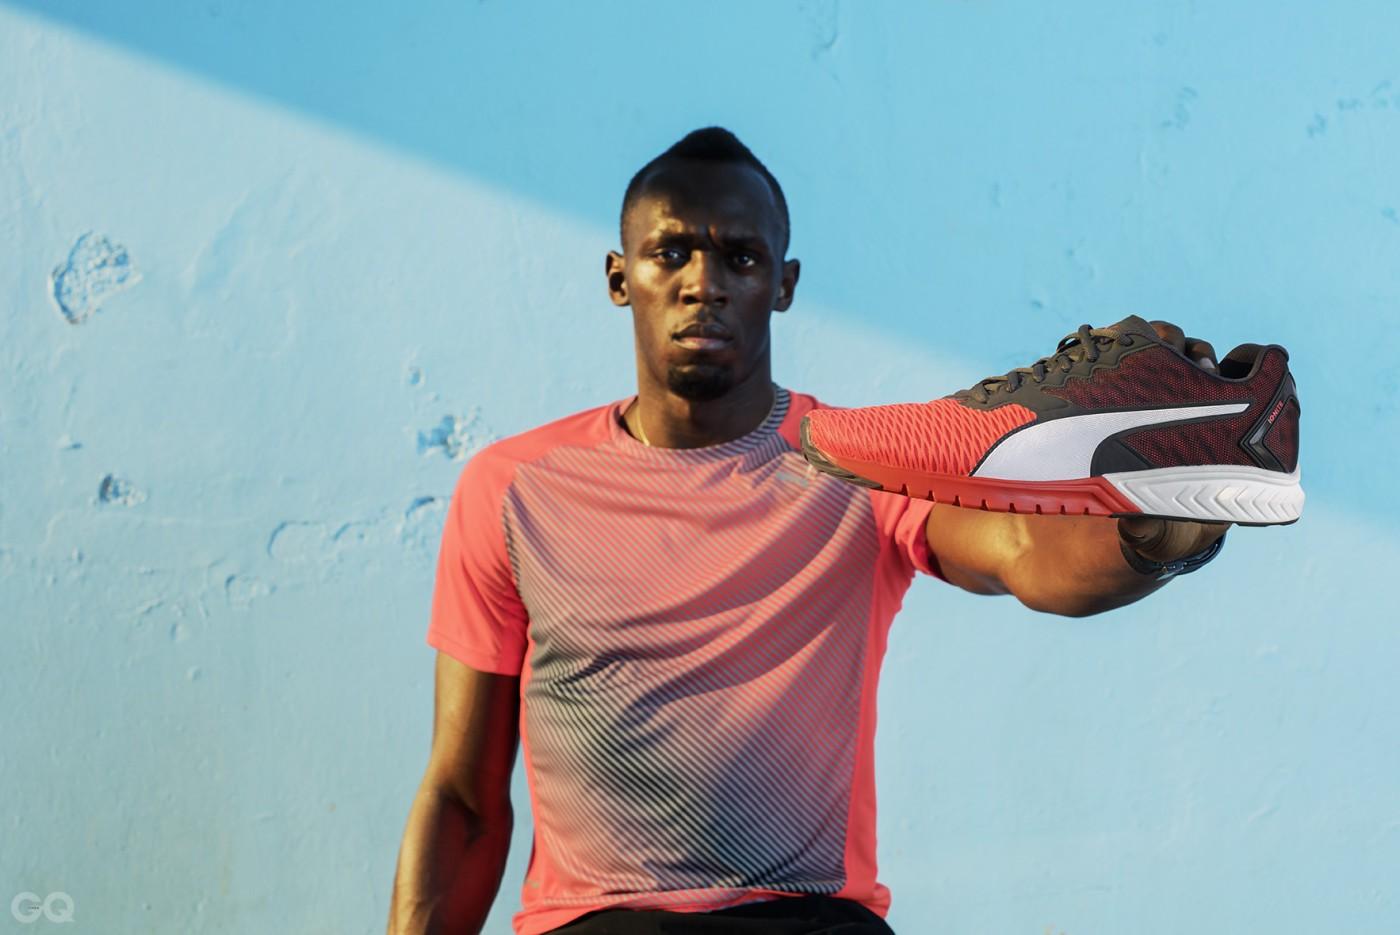 16SS_RT_Bolt_Olympics_Q3_IgniteDual_1384 copy